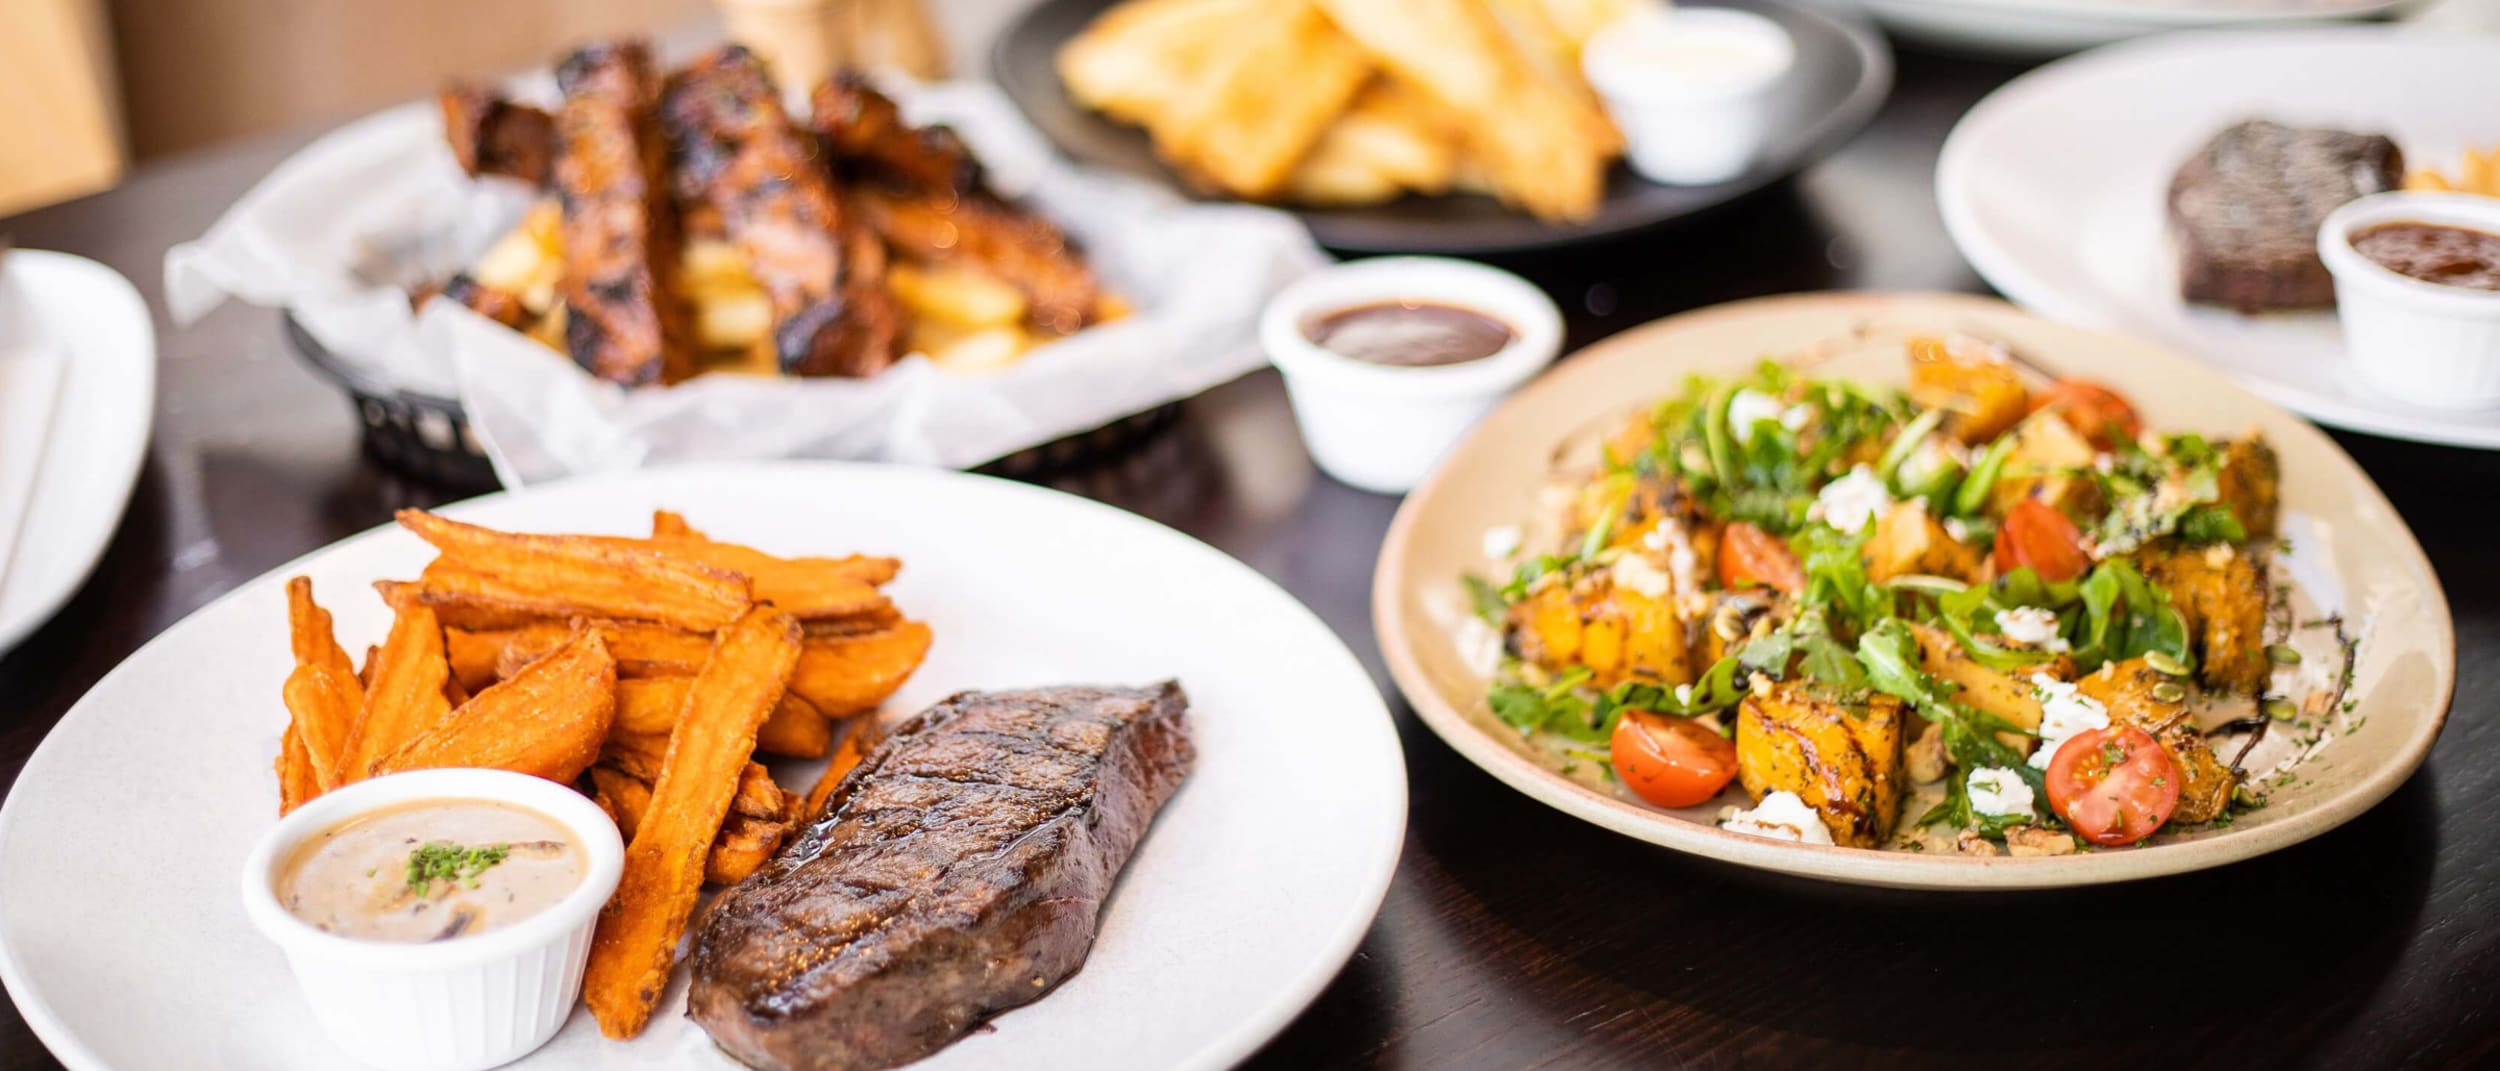 Hurricane's Grill $19.90 Lunch menu